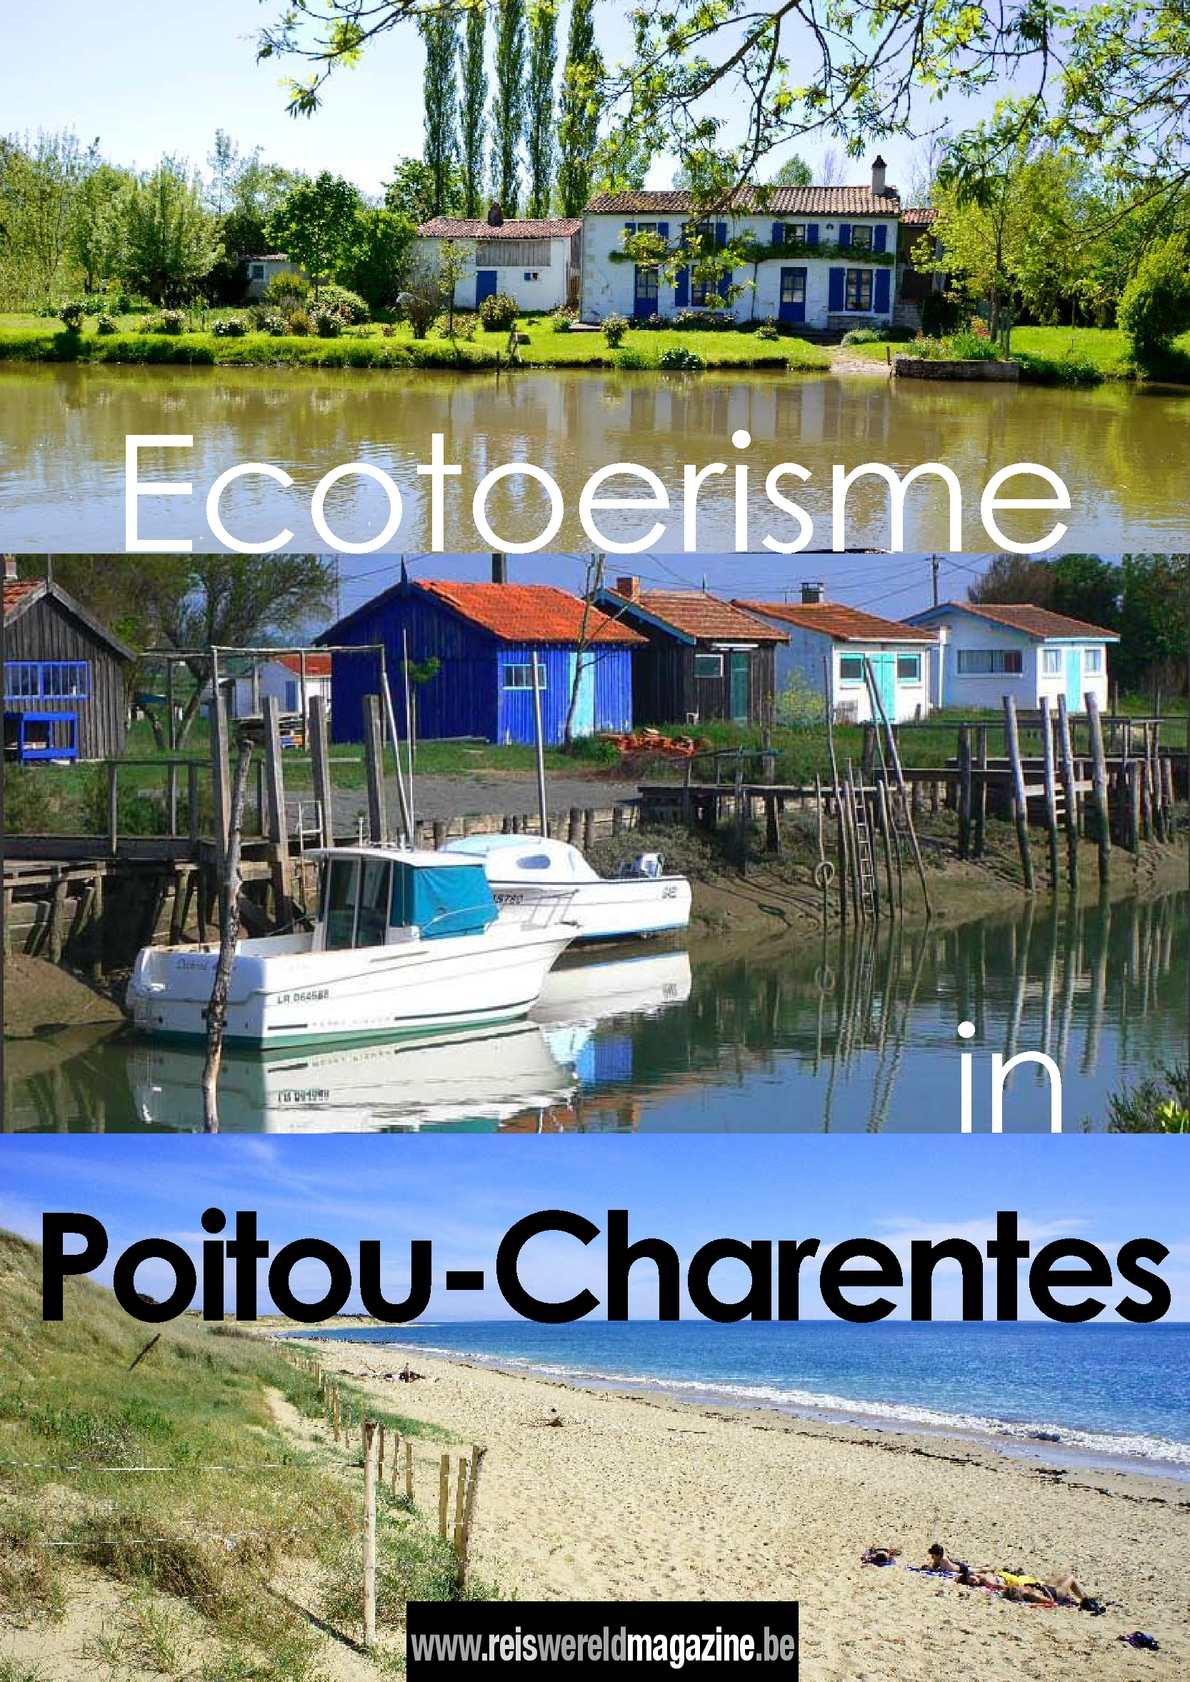 Het ecotoeristische Poitou-Charentes: reportage van Reiswereld Magazine.be